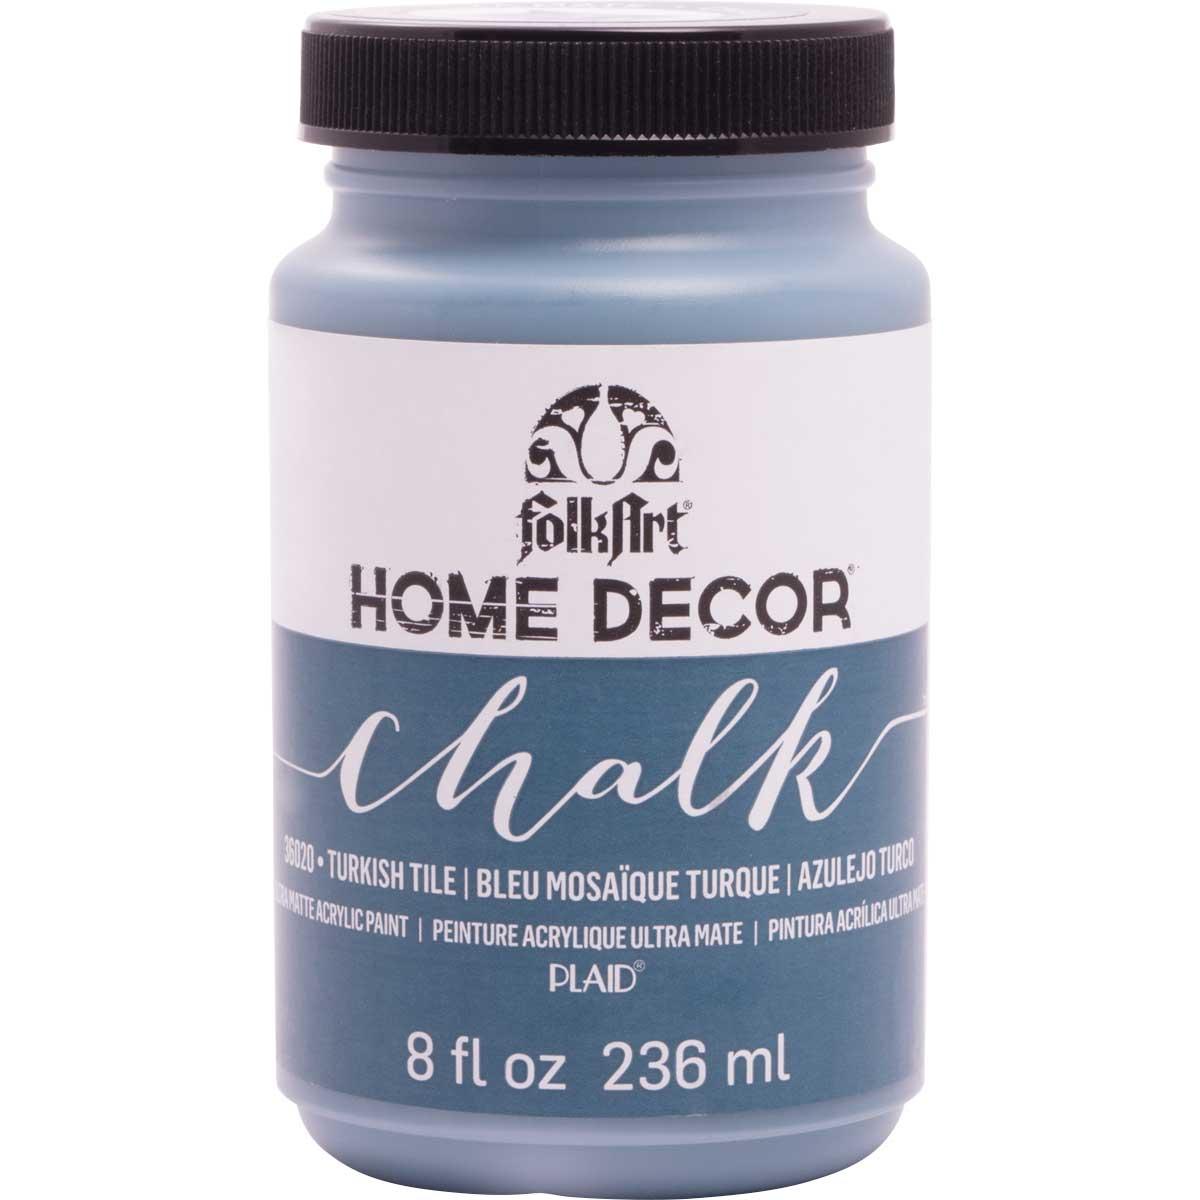 FolkArt ® Home Decor™ Chalk - Turkish Tile, 8 oz.